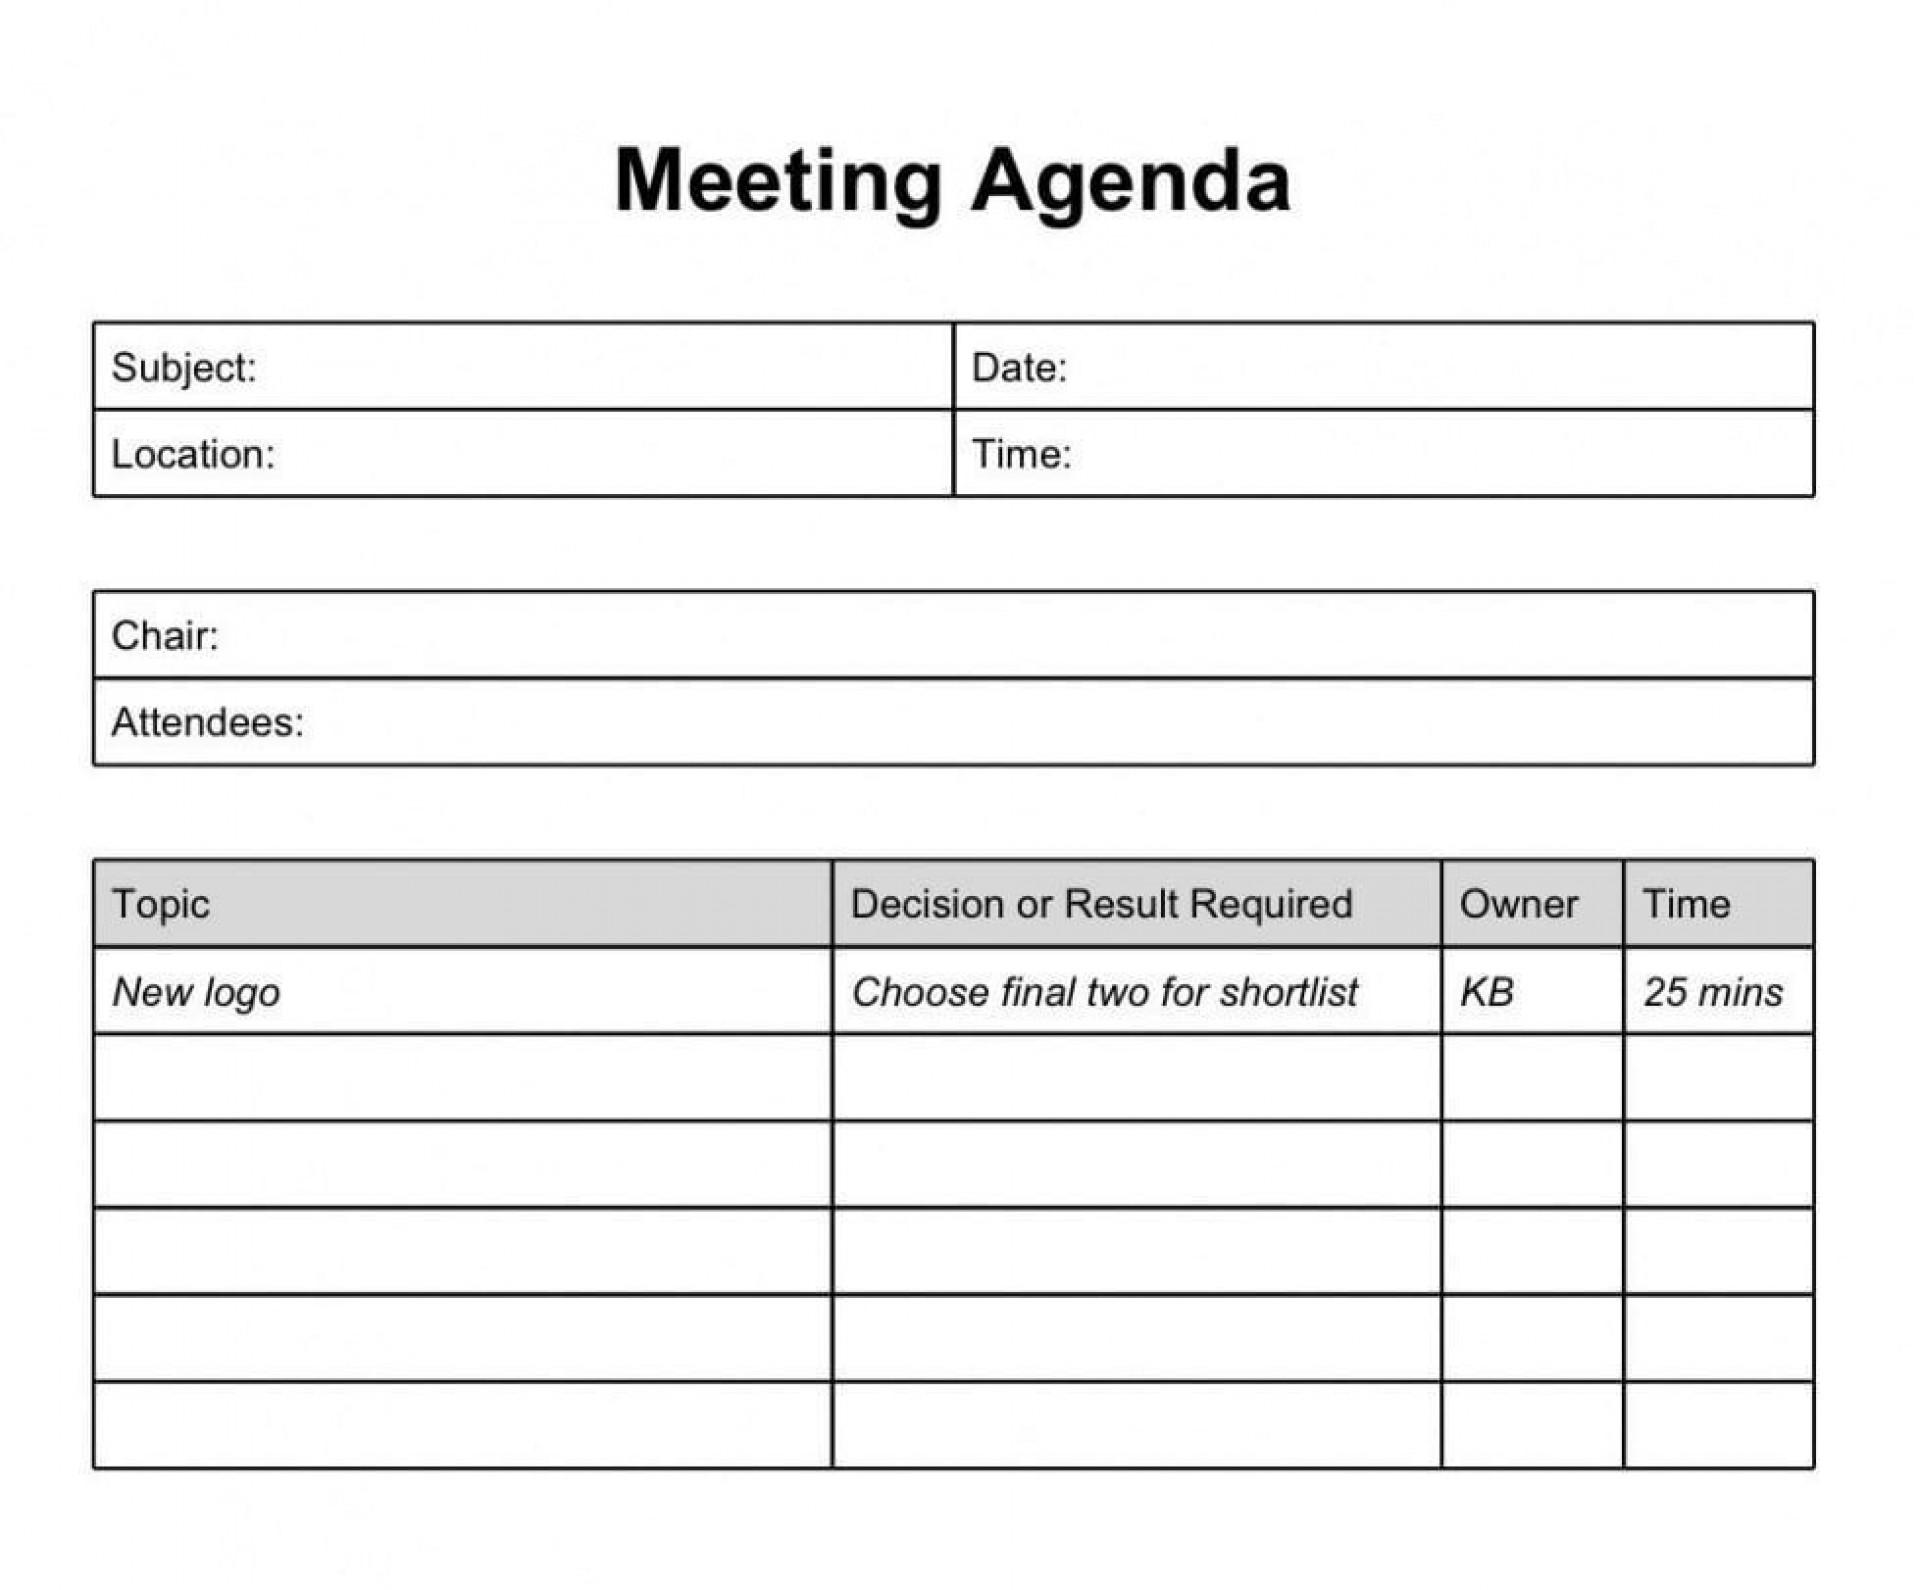 000 Awful Formal Meeting Agenda Example  Template Free Sample1920